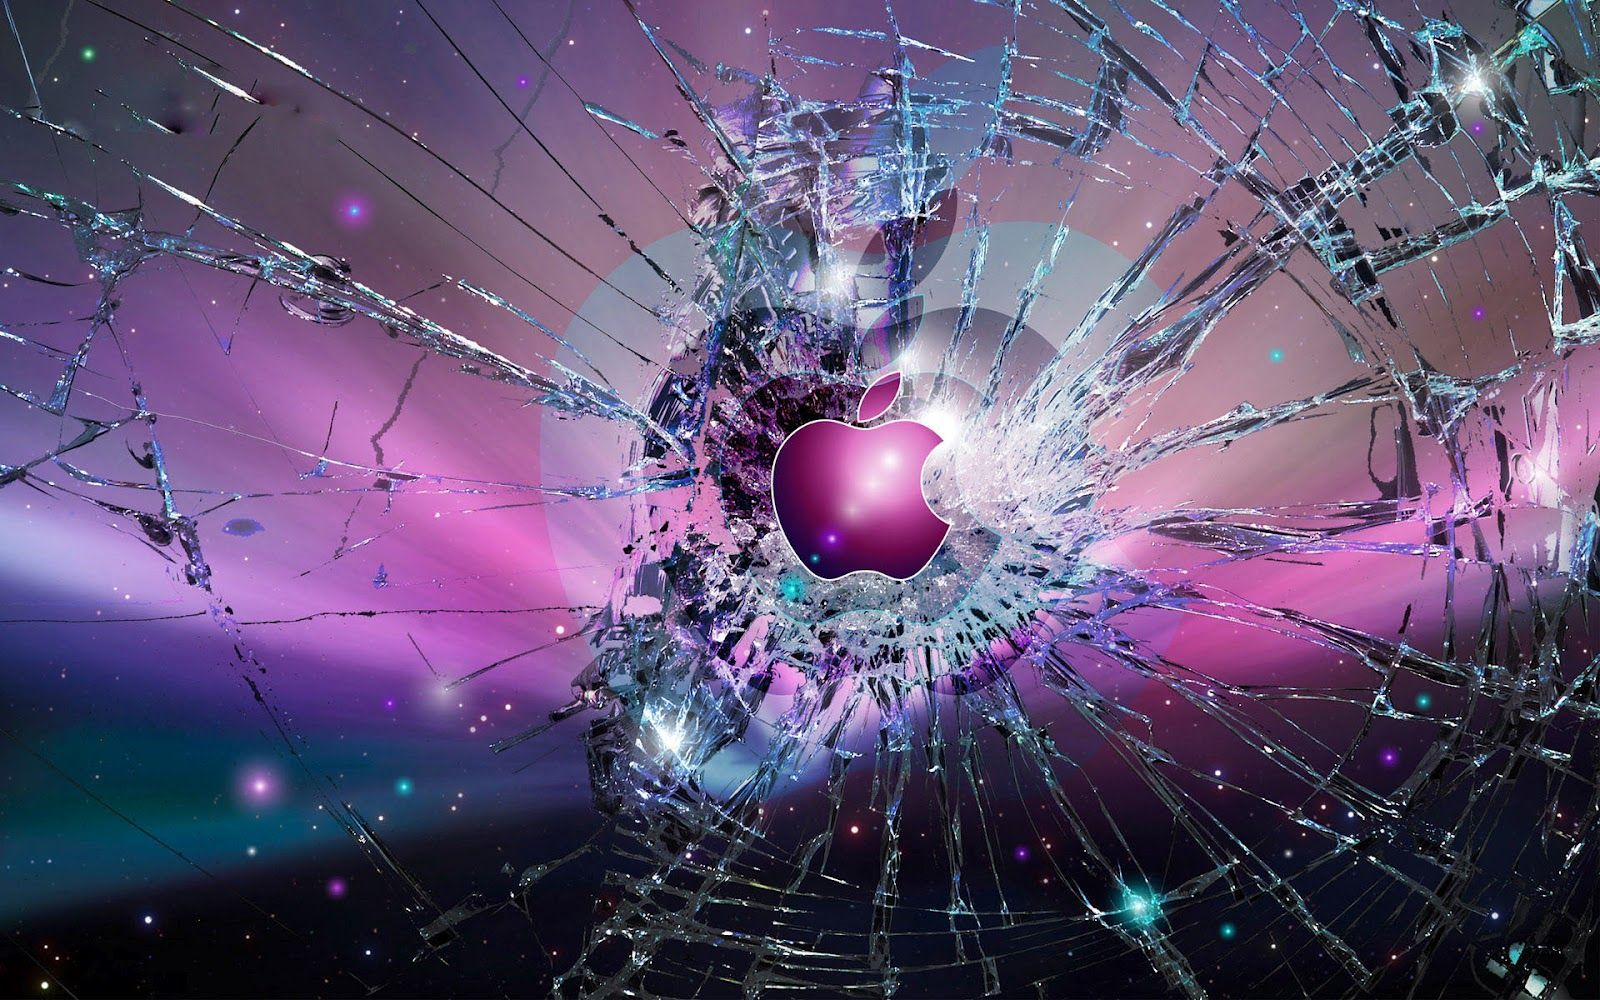 Amazing Wallpaper Macbook Purple - a460475a31c1011ac170d912209a3c4b  Image_96815.jpg